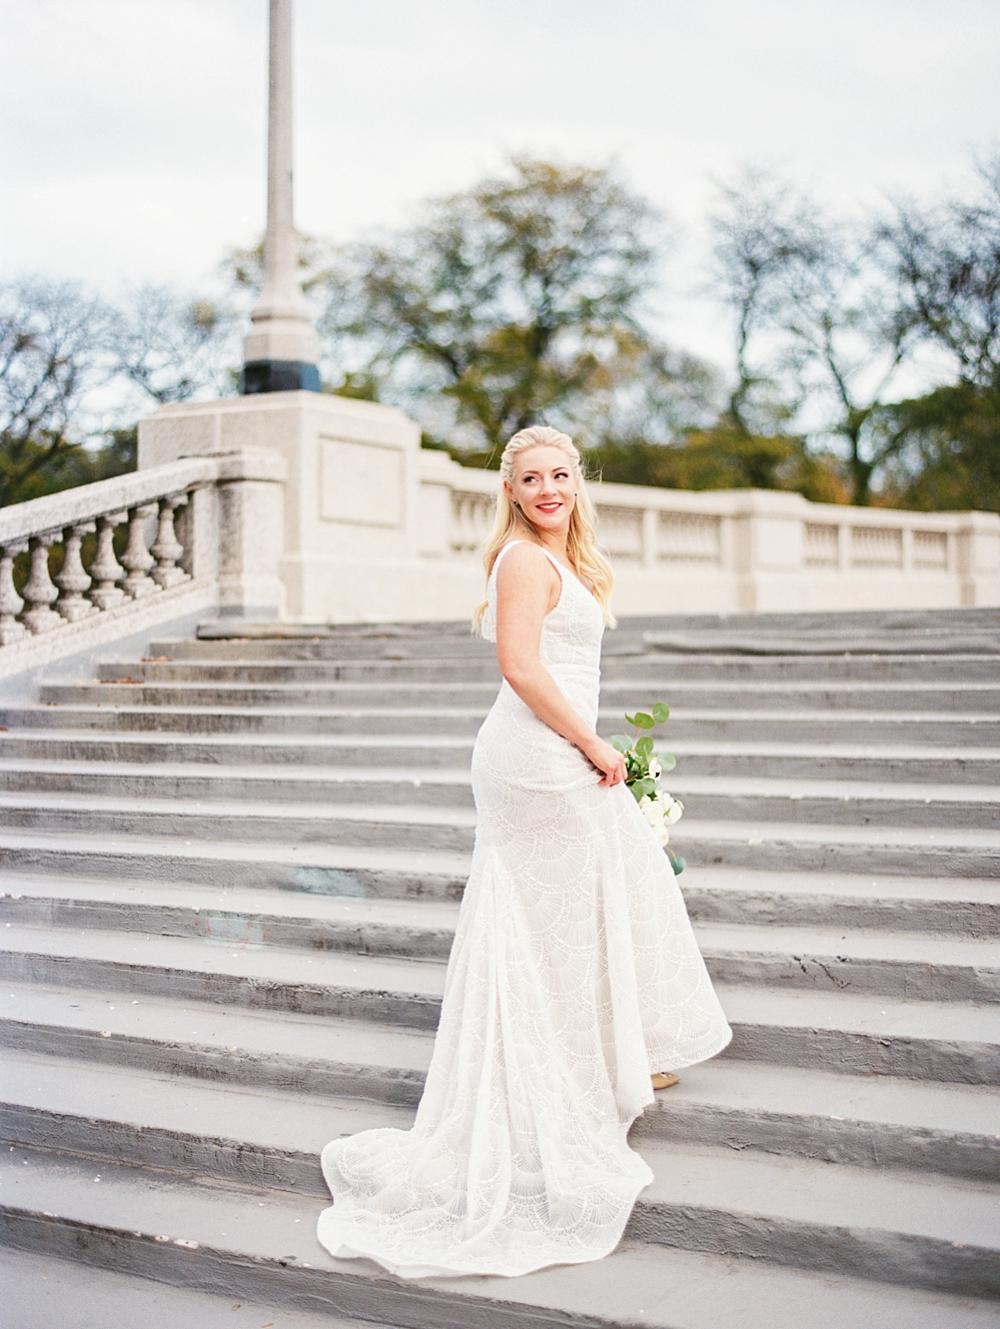 kristin-la-voie-photography-chicago-Wedding-Photographer-kimpton-gray-hotel-214